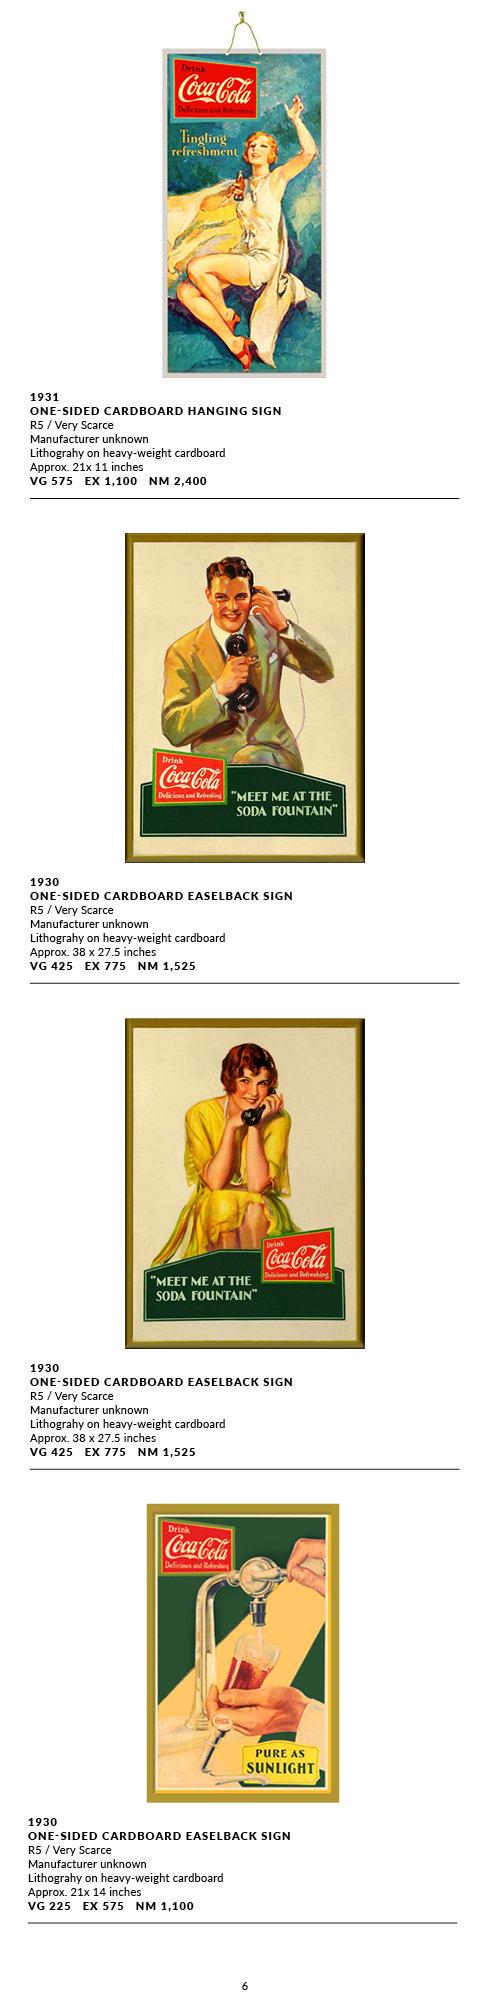 1904-1939RectCardboards (2021)6.jpg